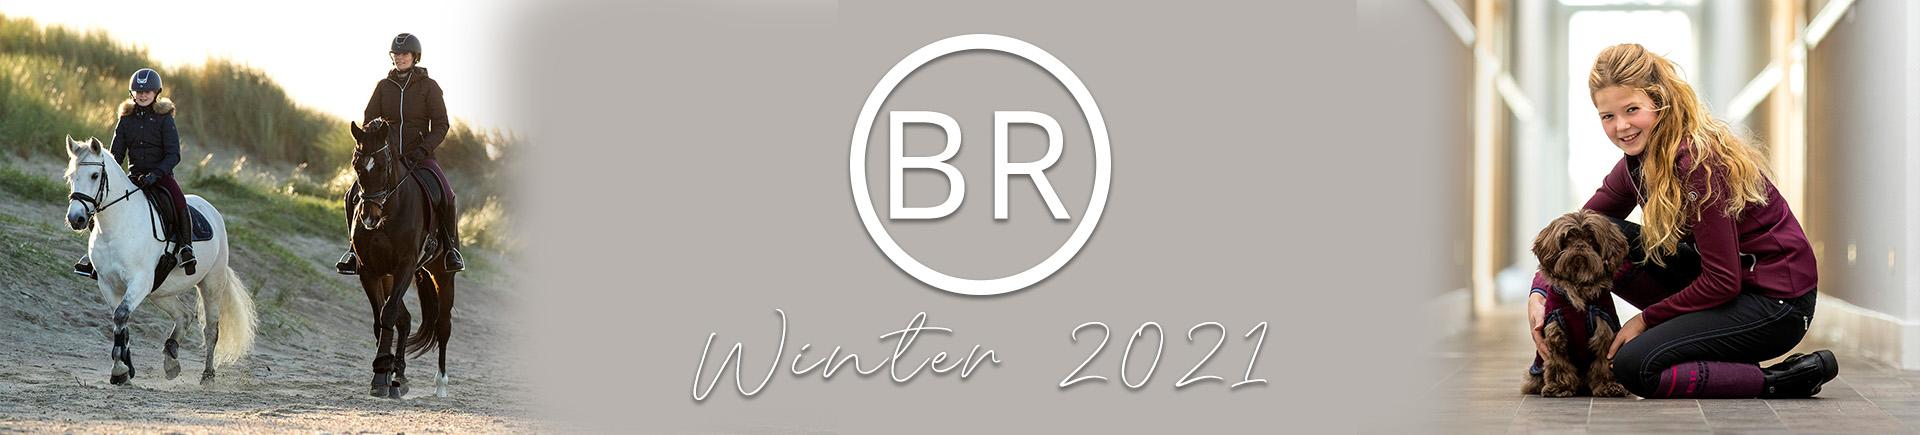 BR 2021 wintercollectie